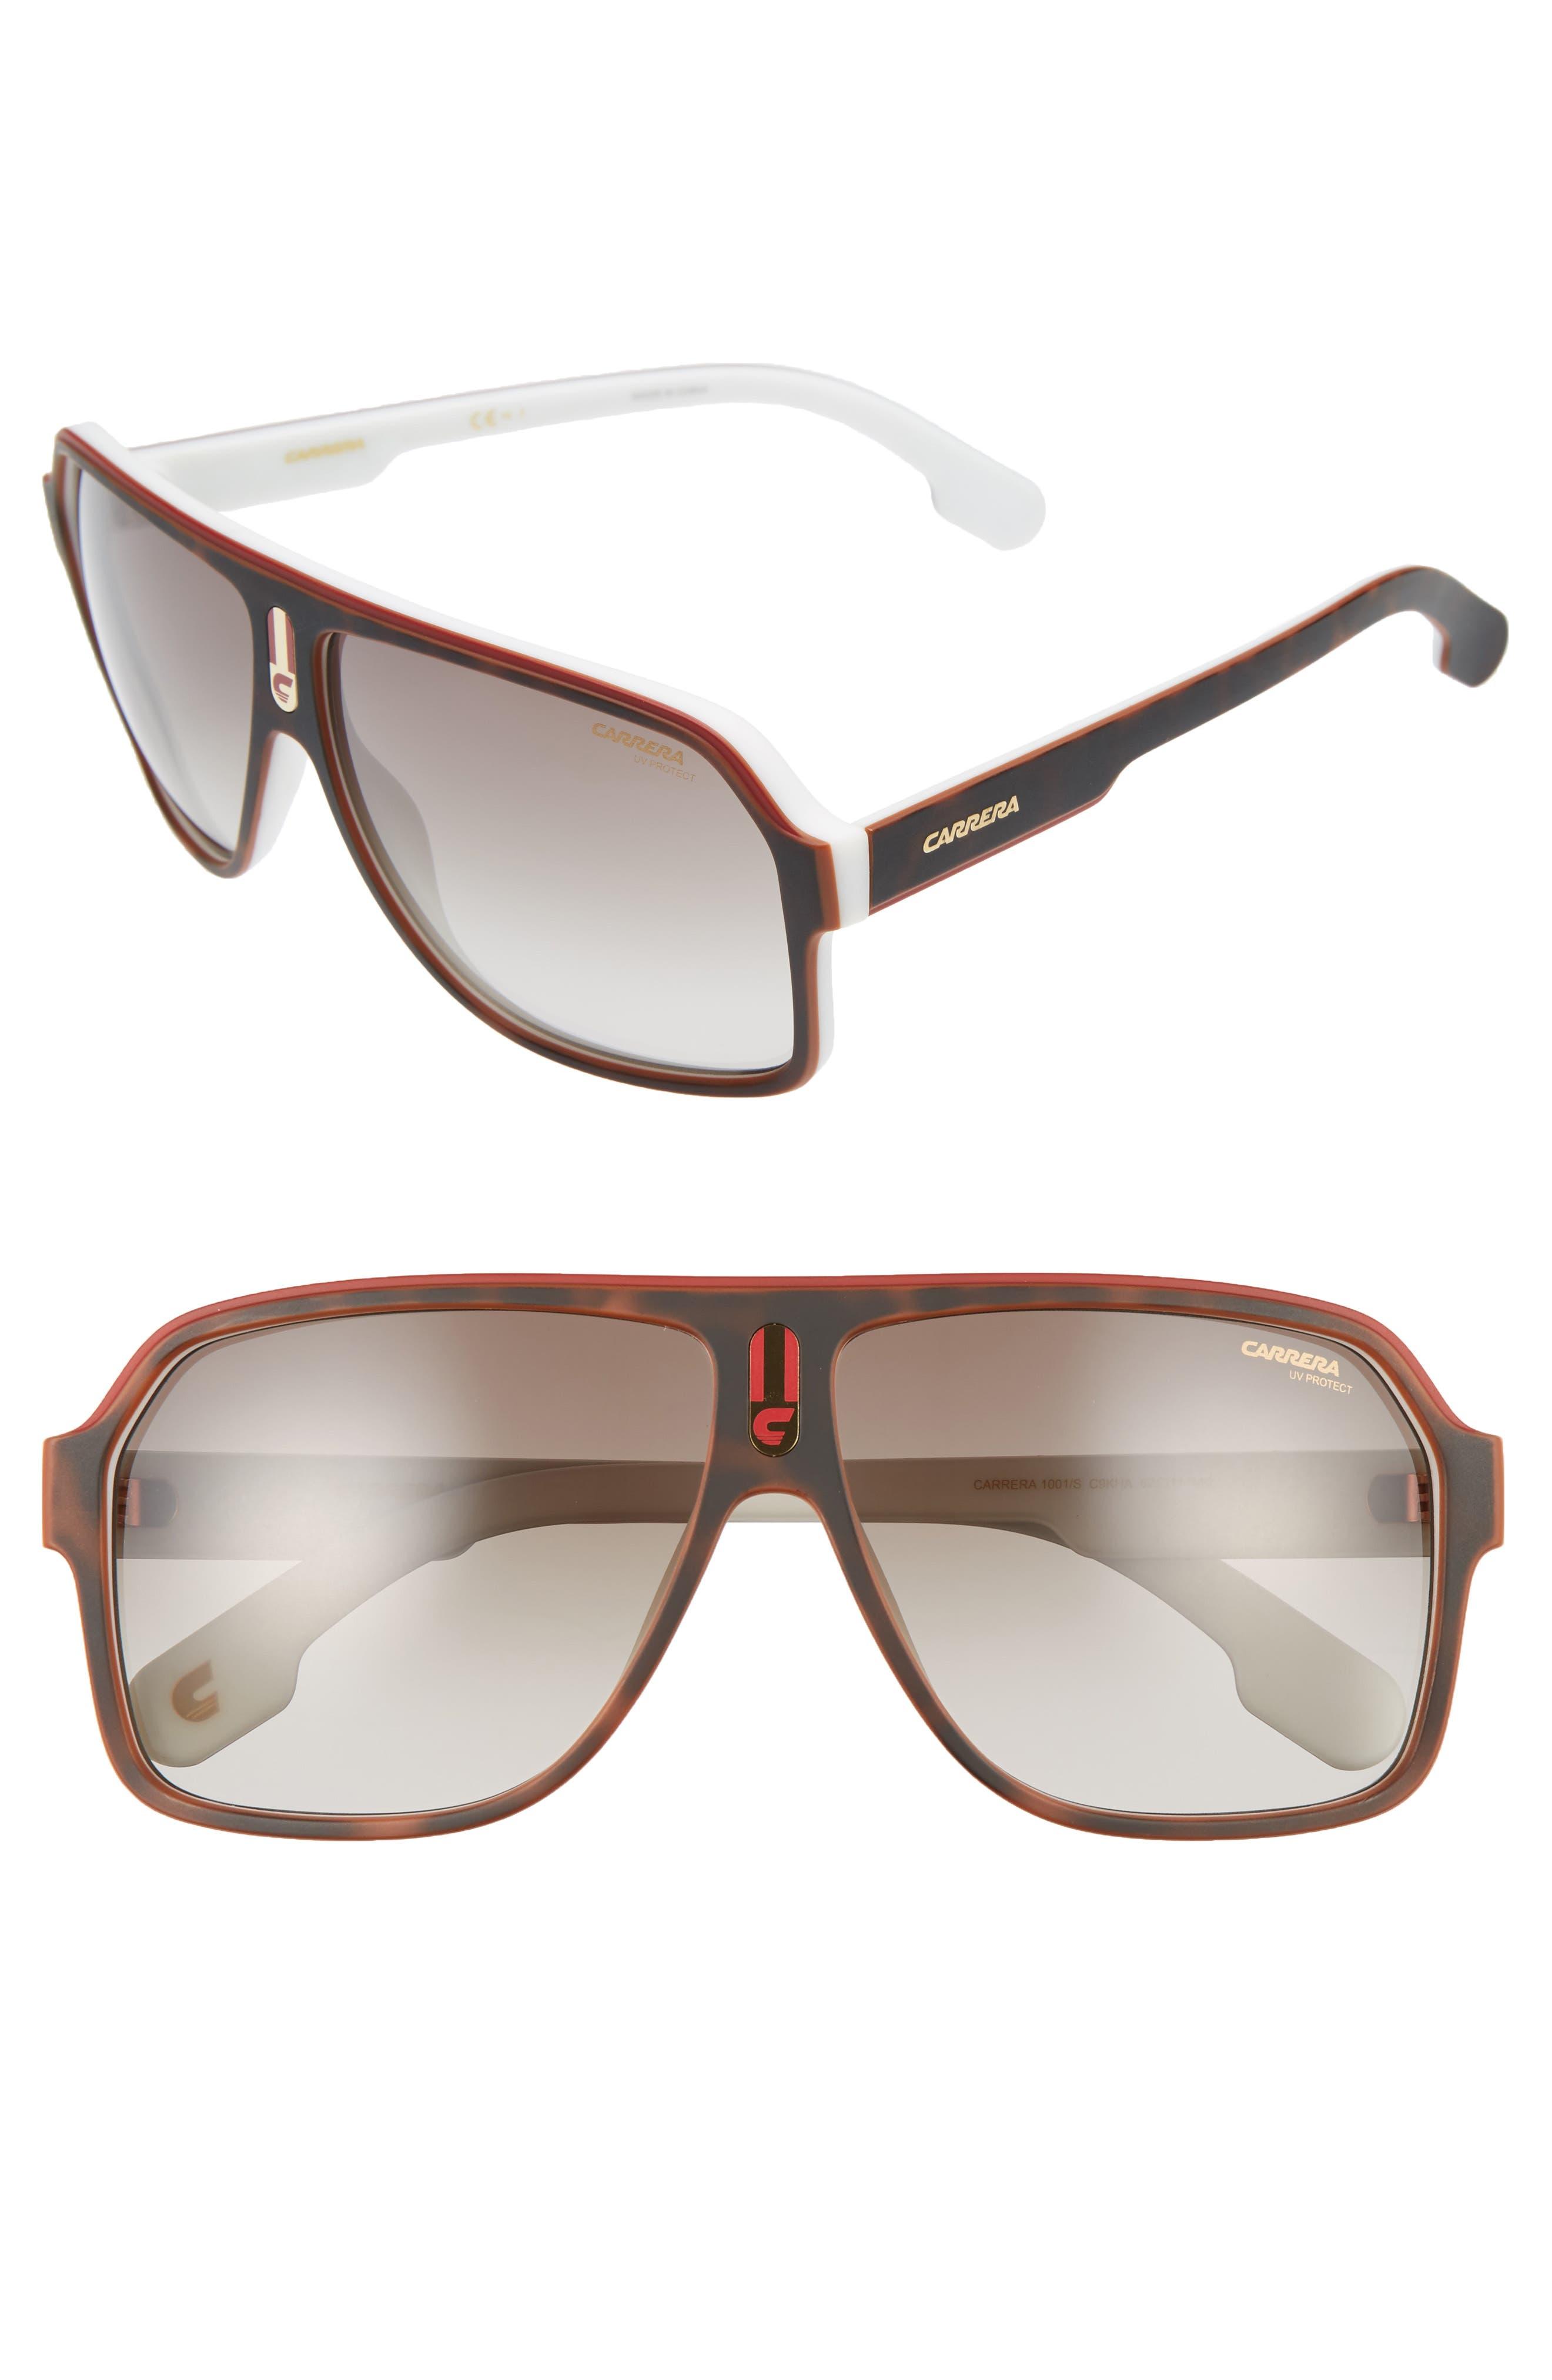 1001/S 62mm Sunglasses,                             Main thumbnail 1, color,                             Havana White/ Brown